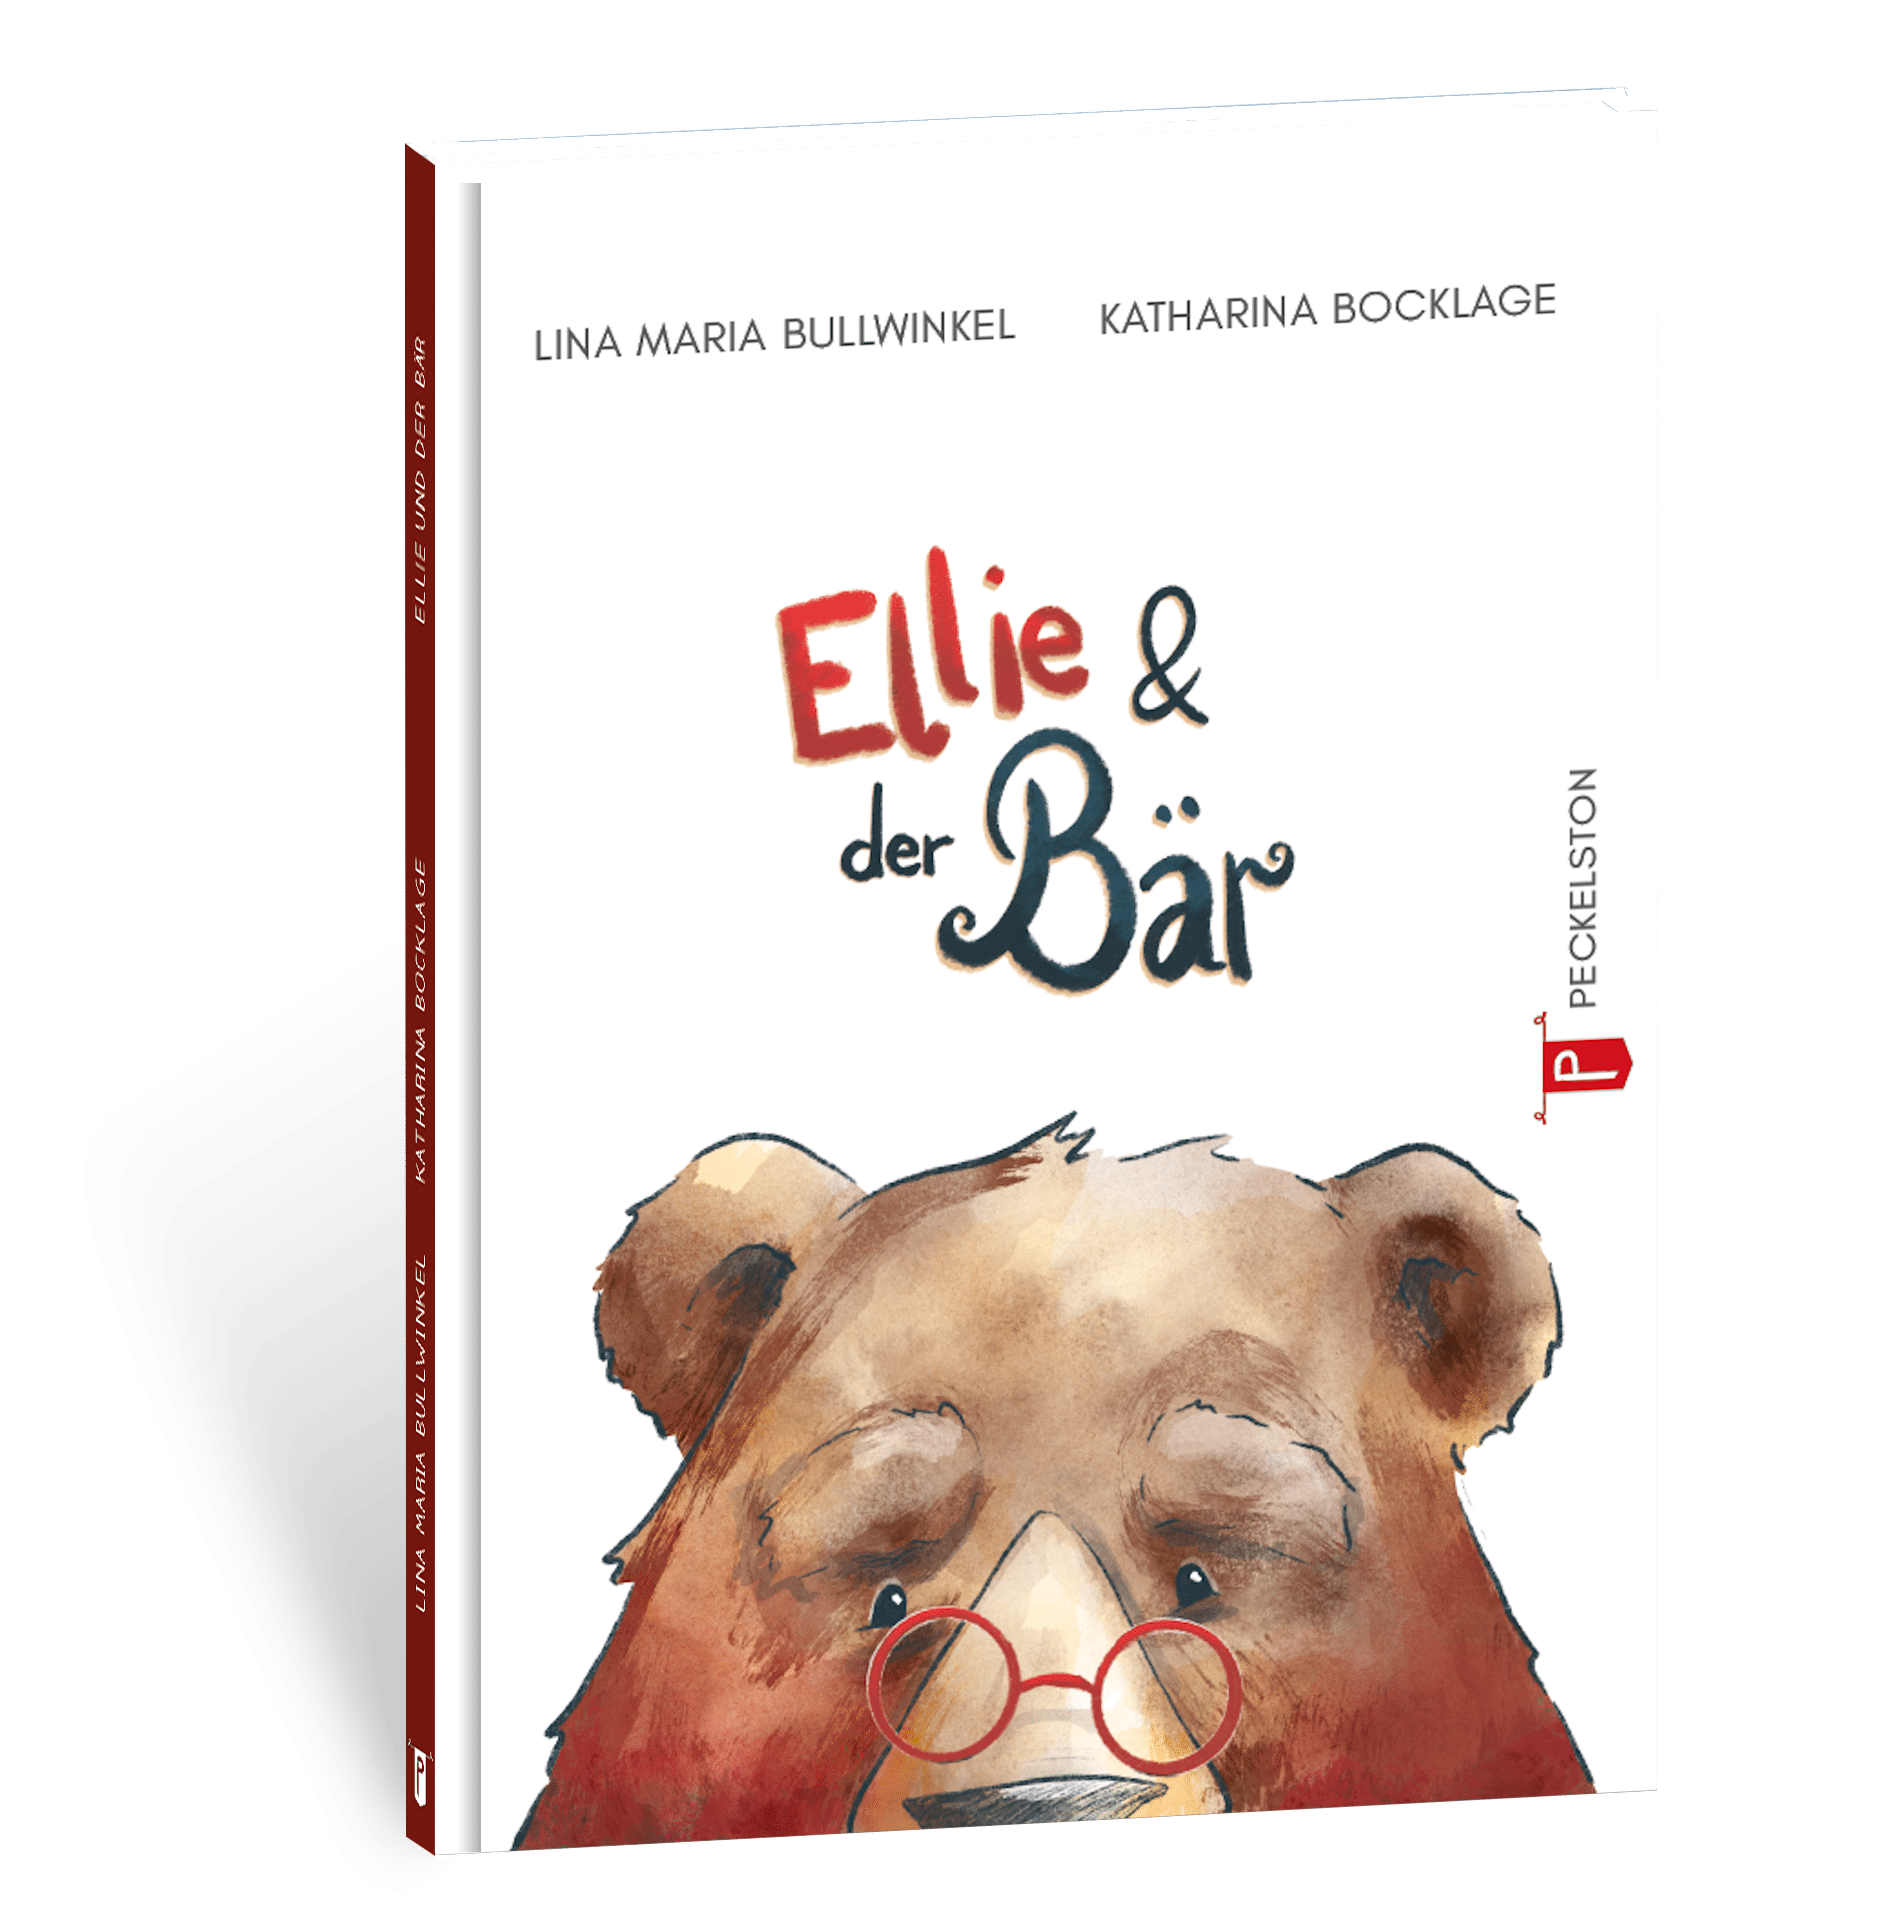 peckelston kinderbuchverlag ellie und der bär lina maria bullwinkel katharina bocklage